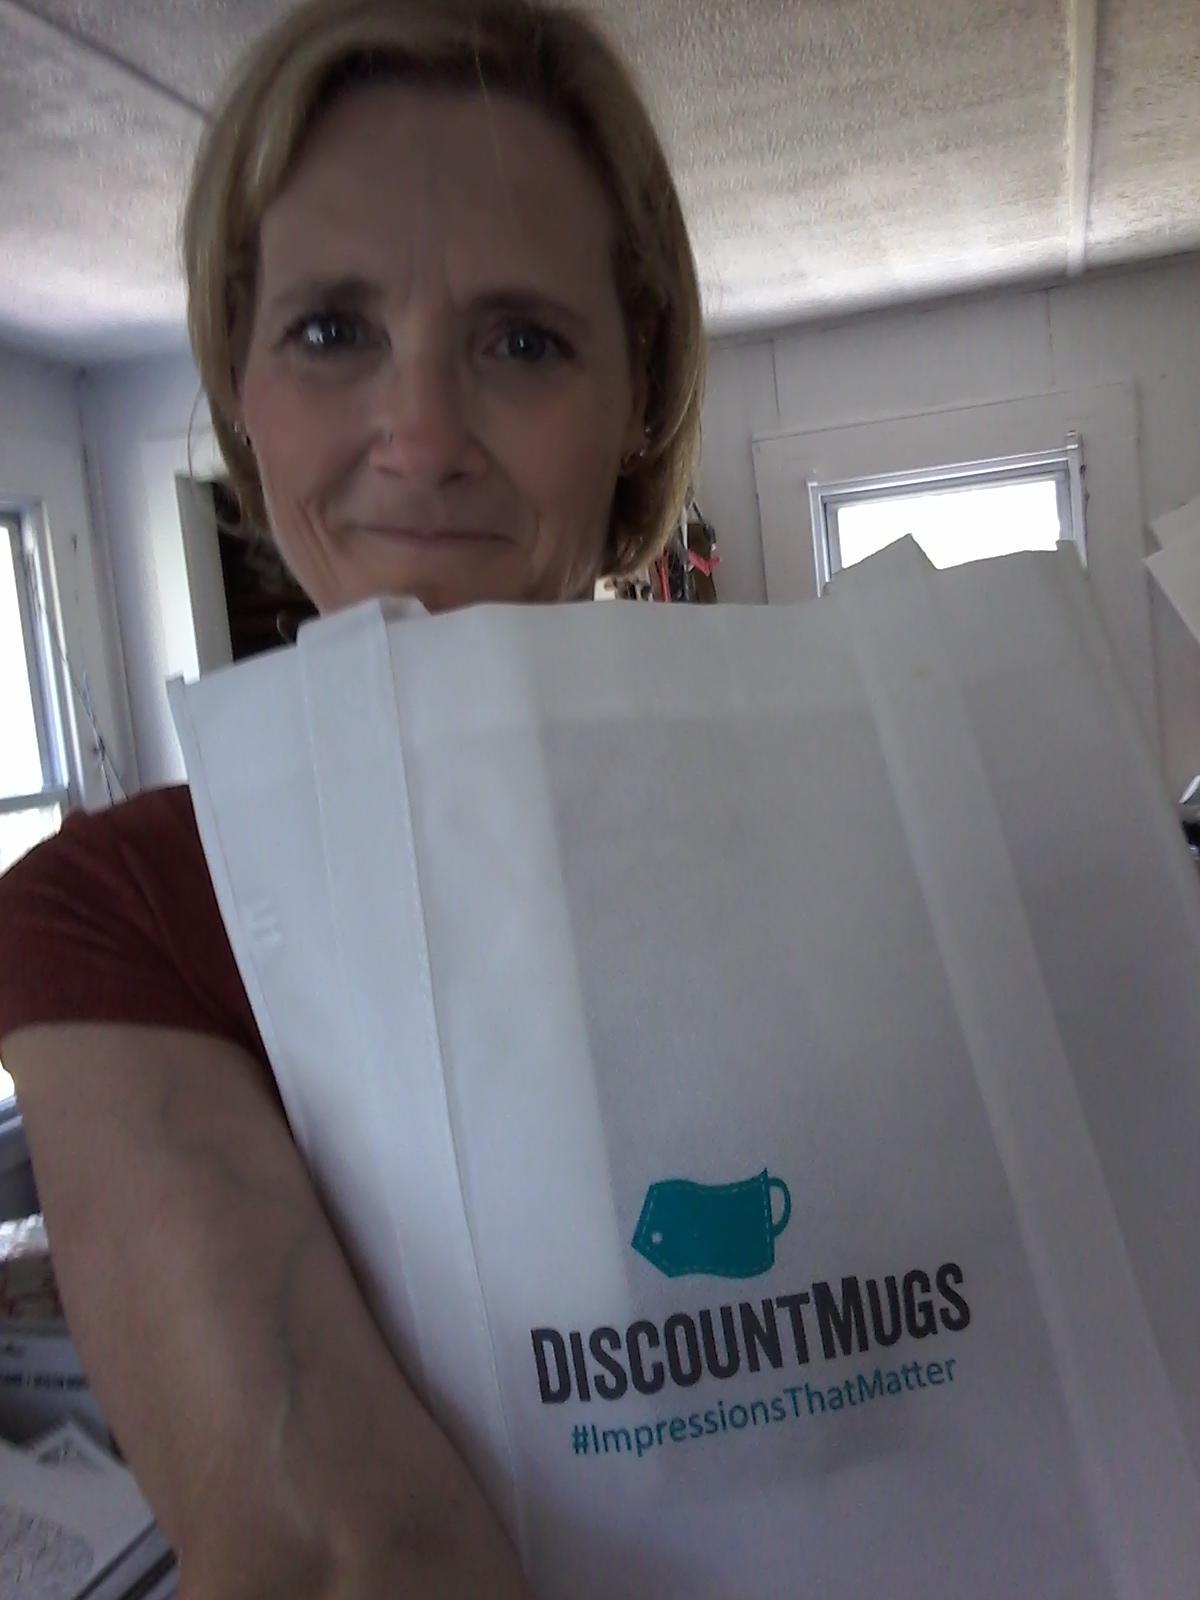 DiscountMugs Gives Back